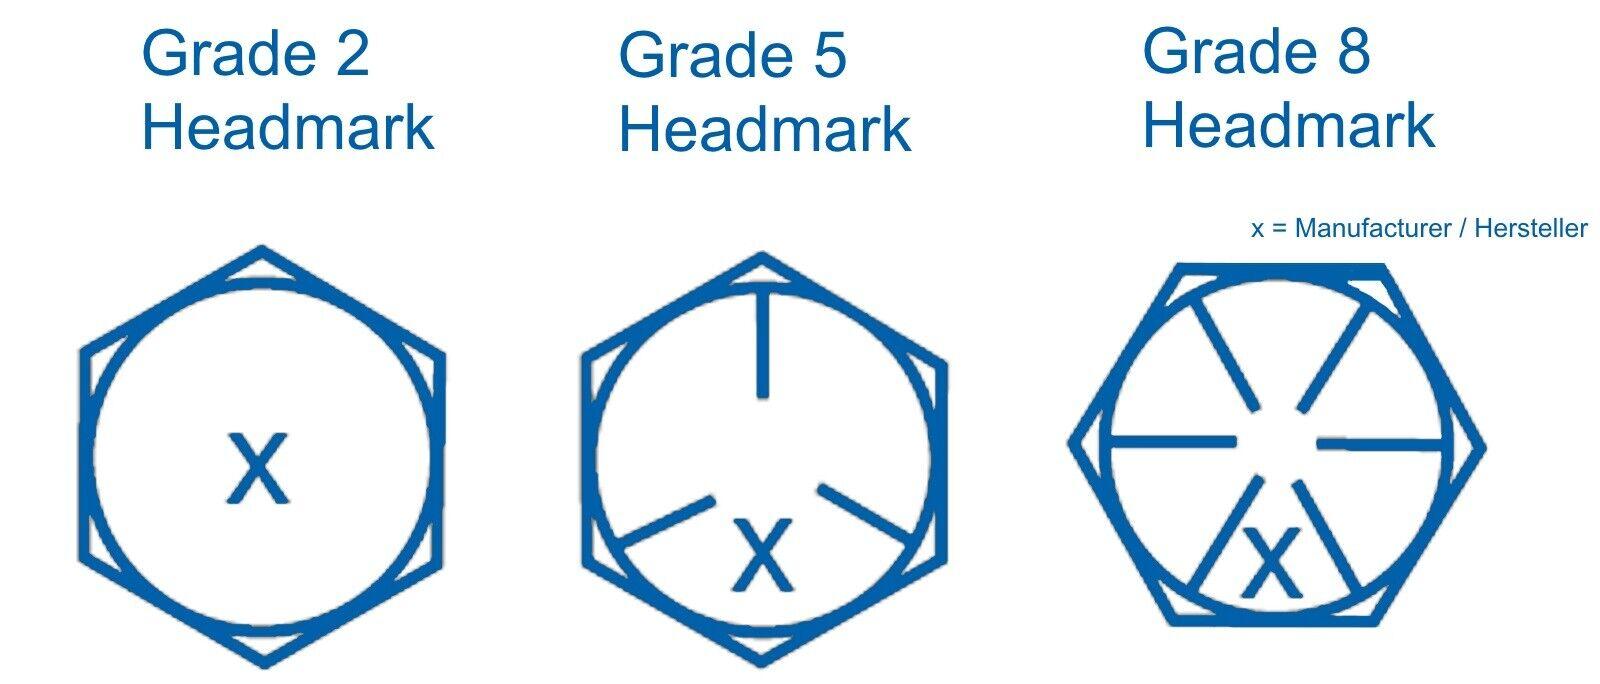 Hex Head Cap Screw Sechskantschraube 1//4-20 UNC x 2 1//2 Grd.5 verzinkt